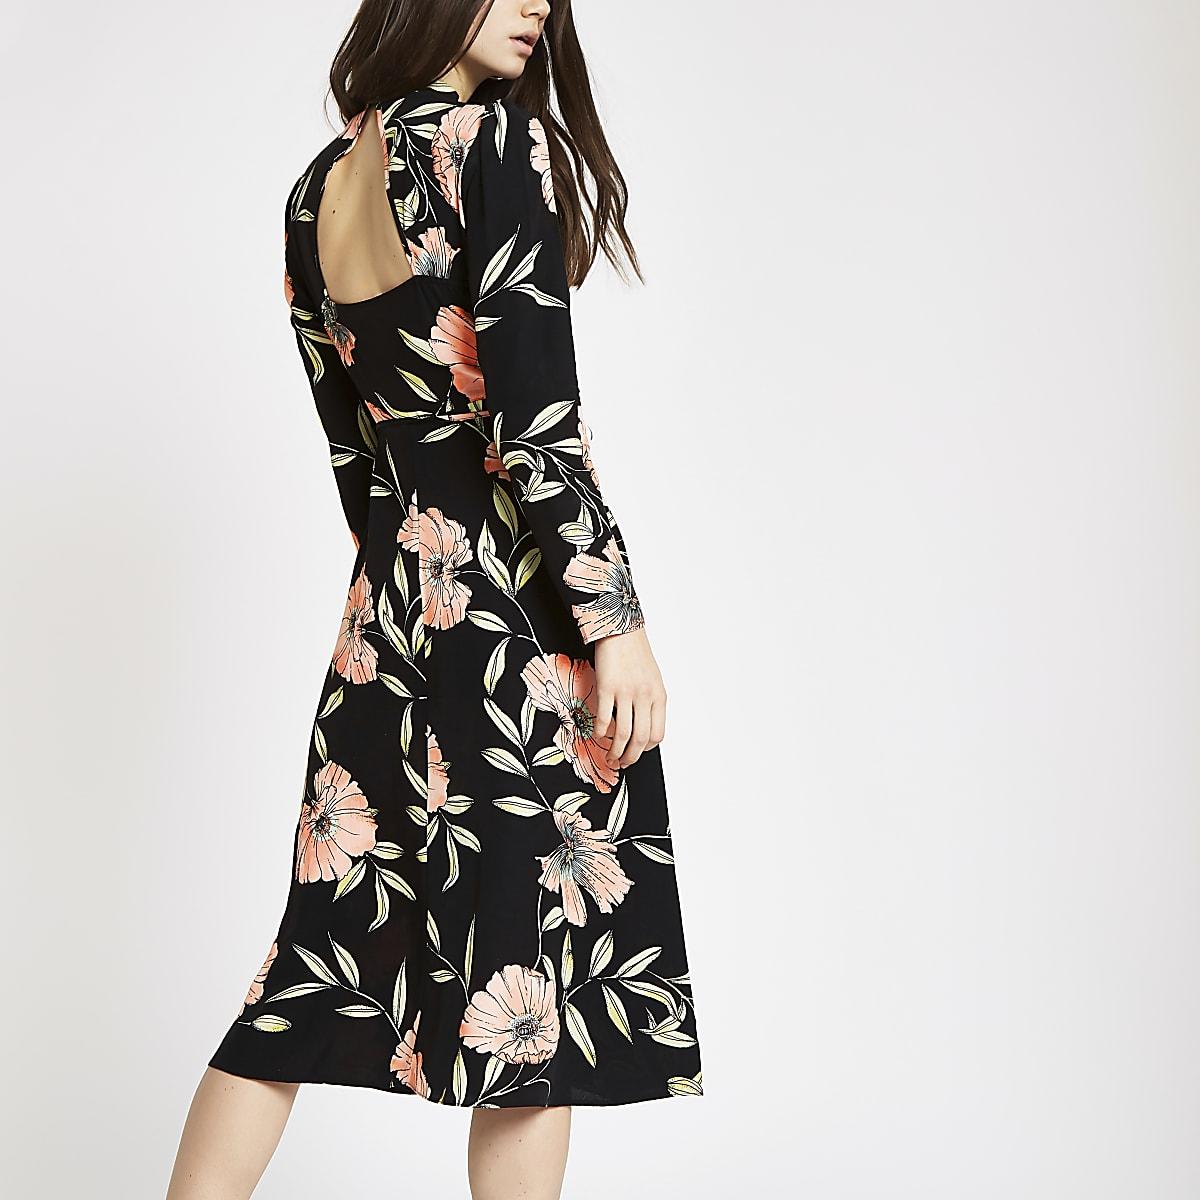 Black floral high neck midi dress